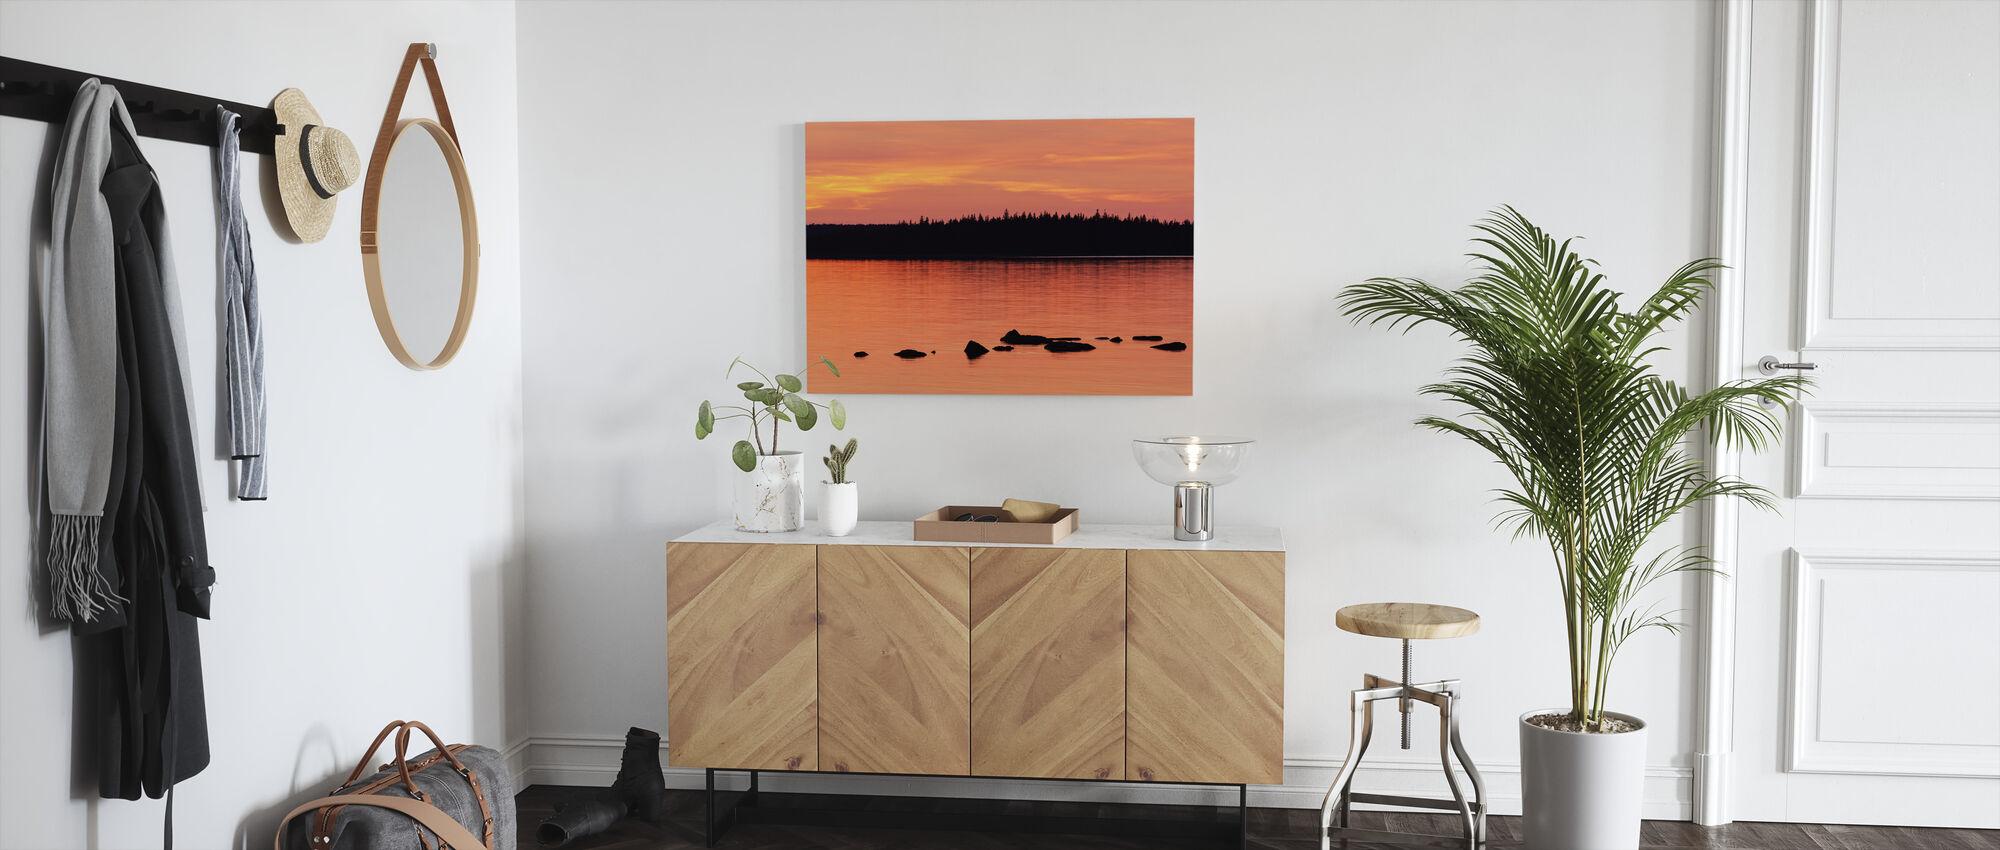 Sundown, Gotland - Canvas print - Hallway